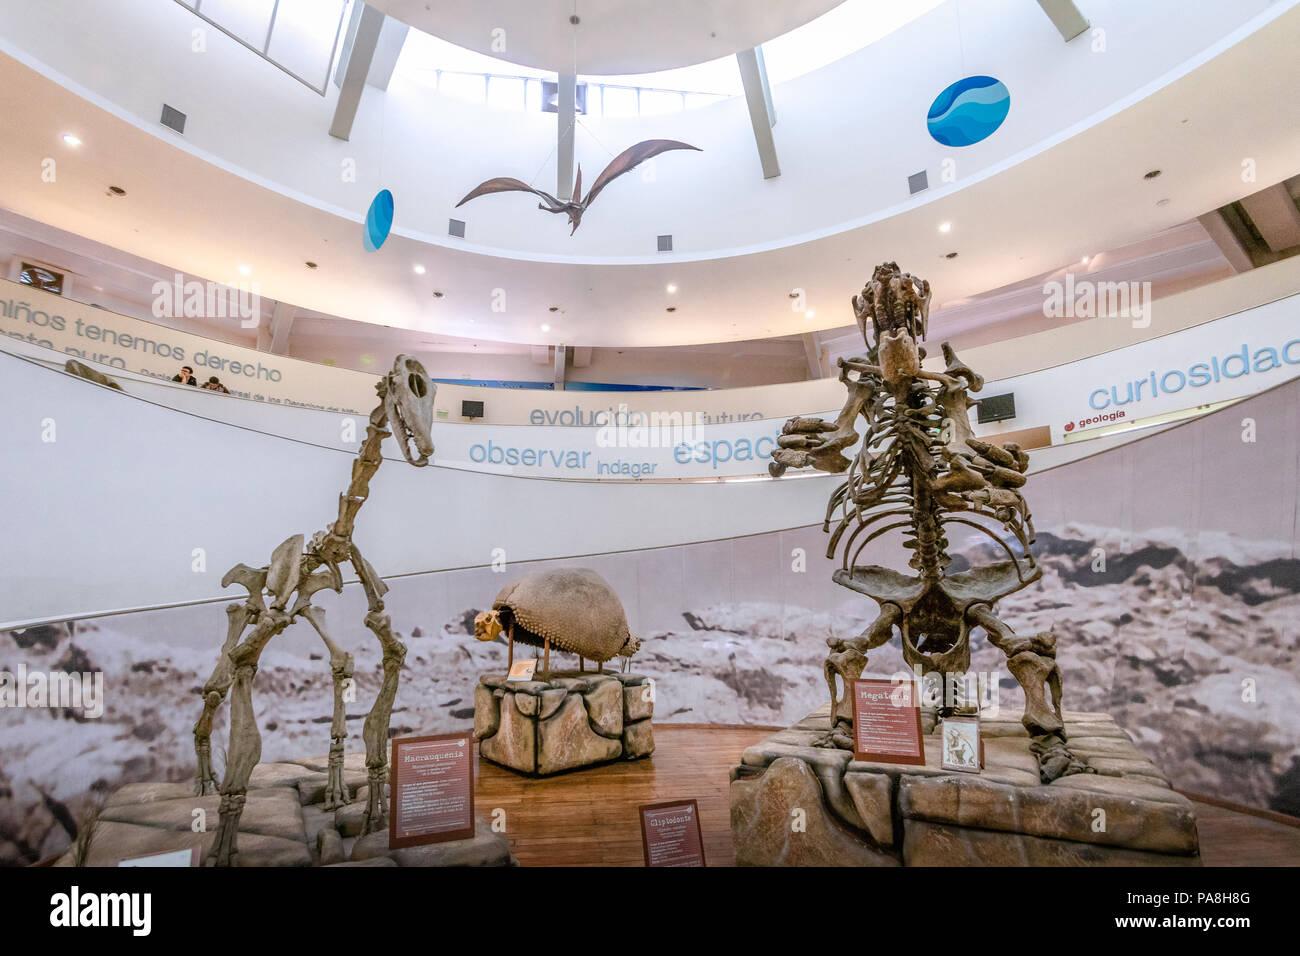 Natural Sciences Museum (Museo Provincial de Ciencias Naturales) Interior - Cordoba, Argentina - Stock Image